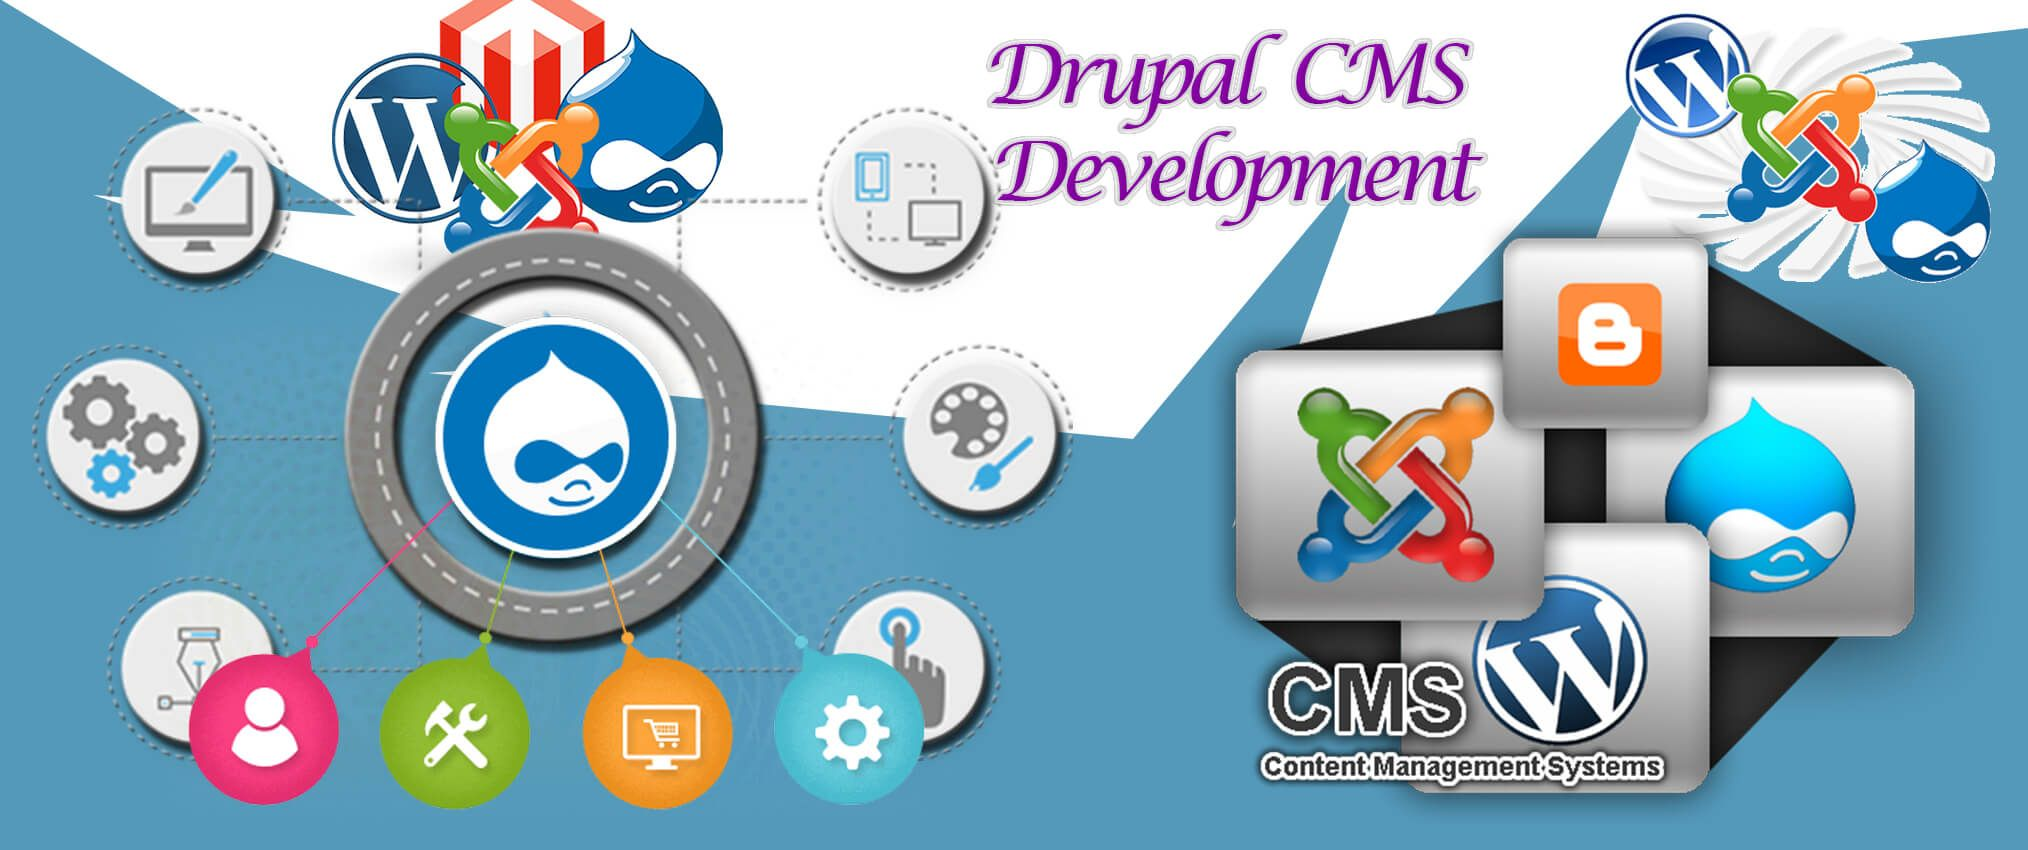 Allianze Technologies Is A Drupal Web Development Company In India Offers Best Cms Website Development Services Drupal Wordpress Website Design Website Design